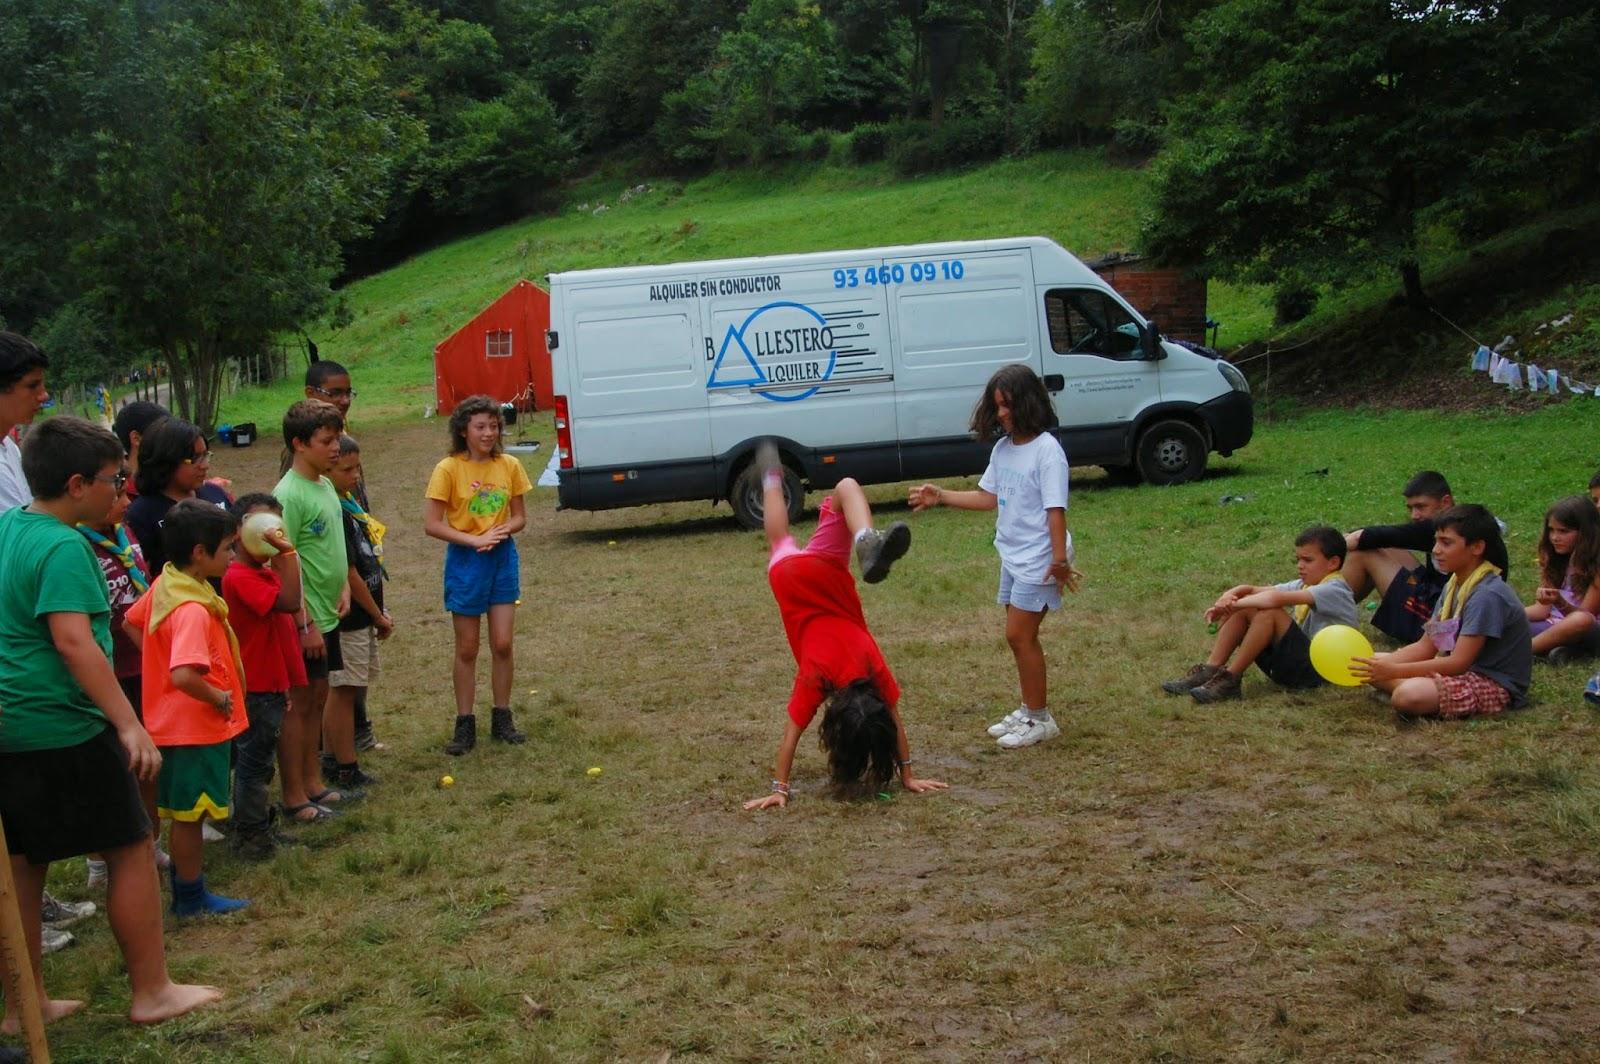 Campaments Estiu RolandKing 2011 - DSC_0268.JPG